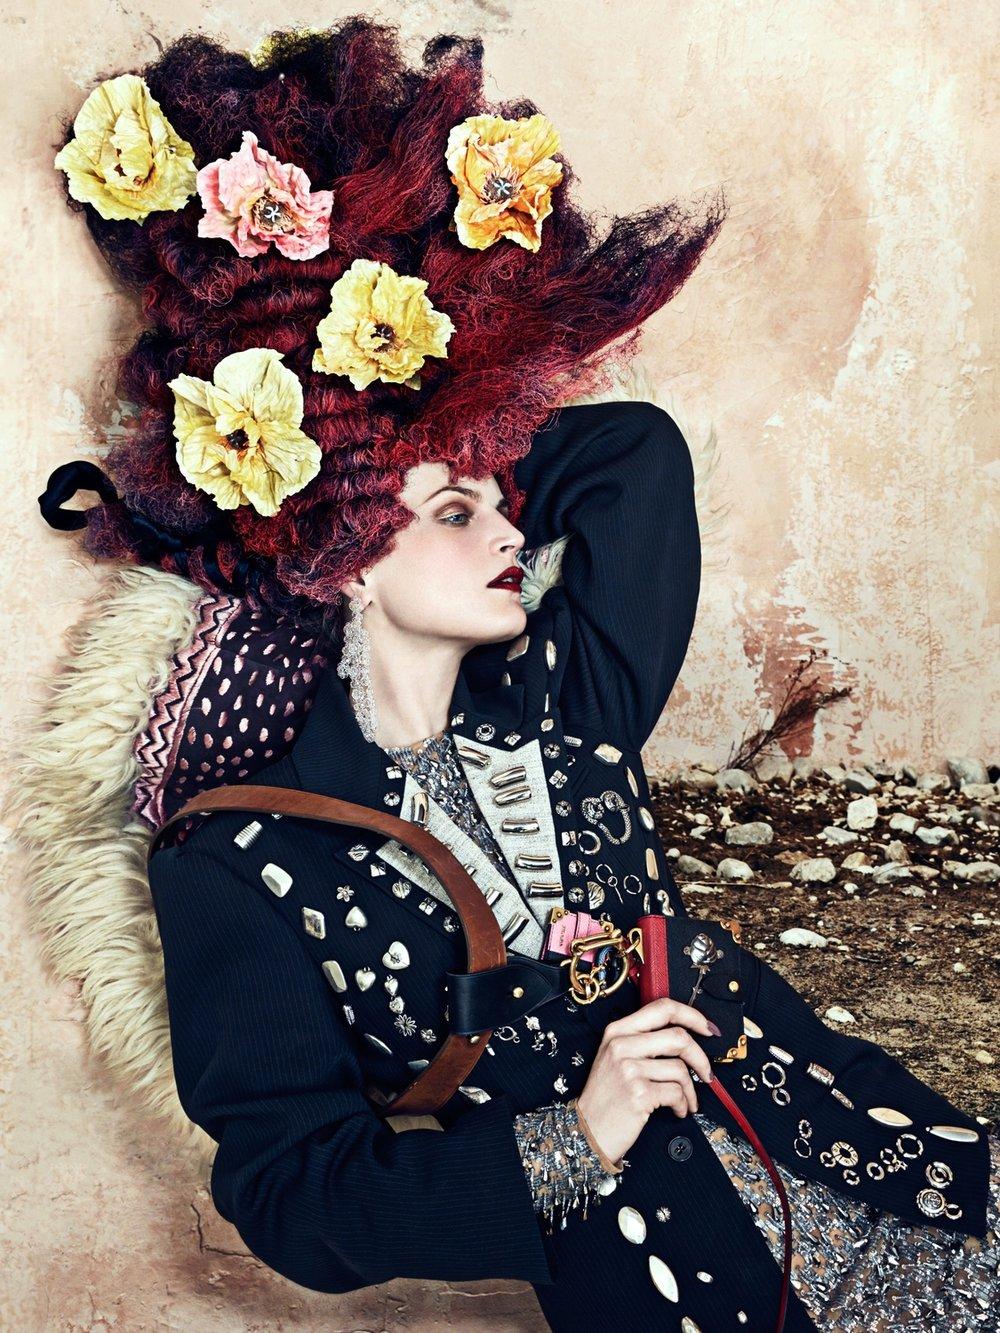 cr-fashion-book-no9-fall-winter-2016-guinevere-van-seenus-by-bjorn-iooss-05.jpg